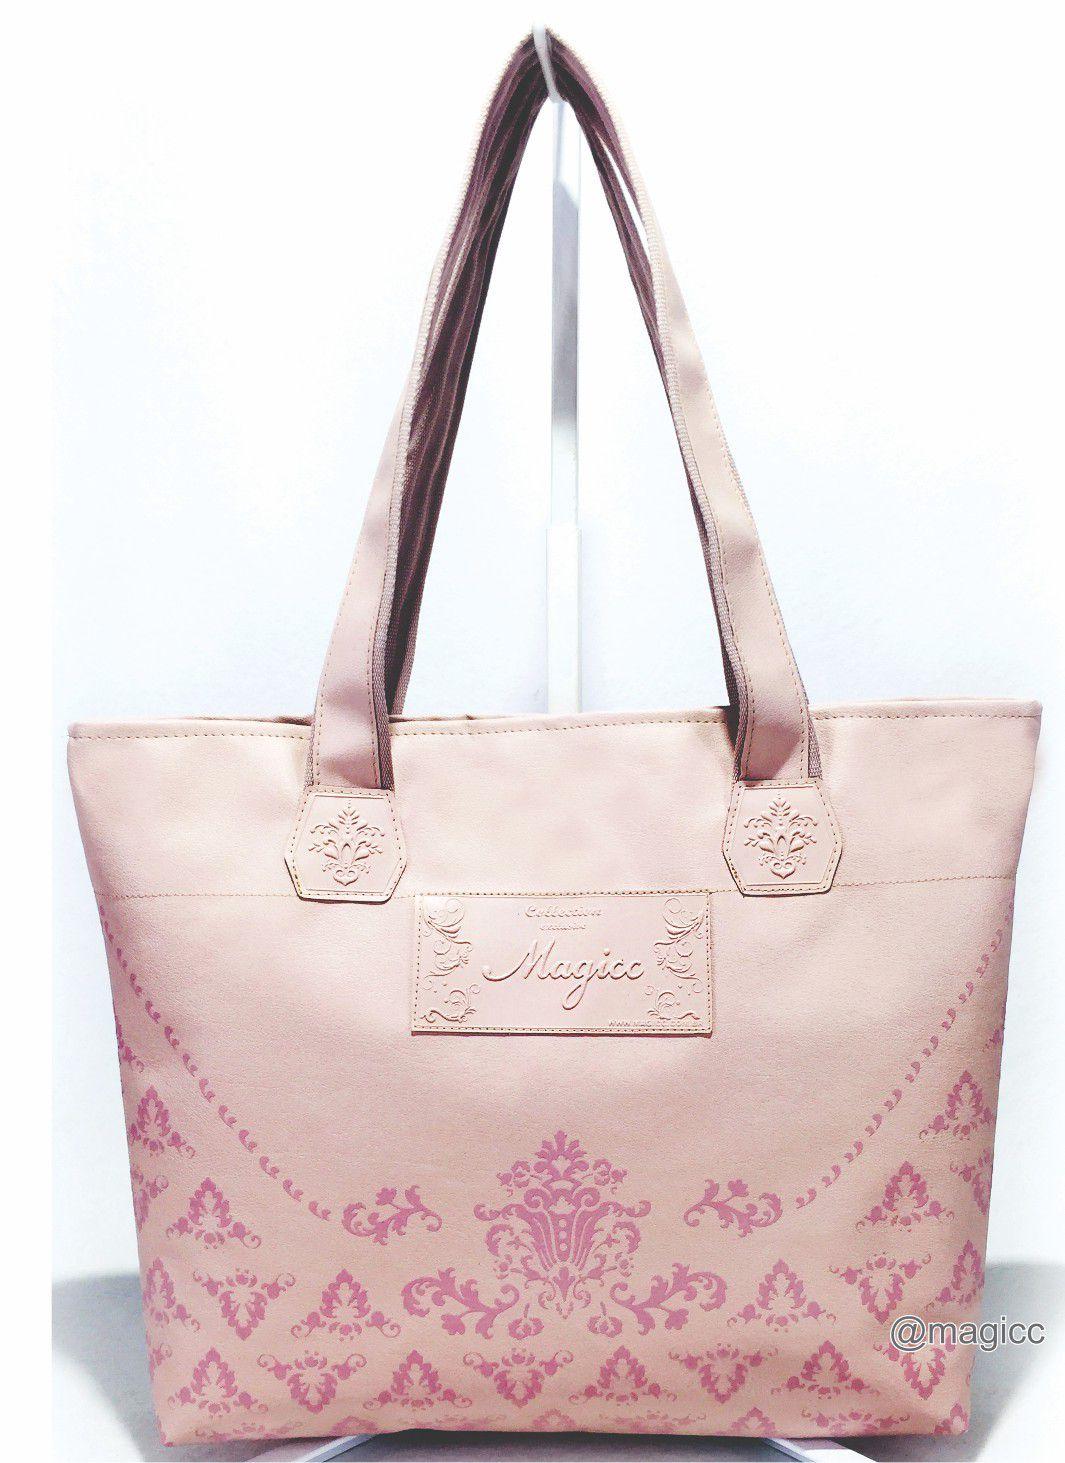 Kit Feminino Casual Arabesco Rosa com Bolsa, Necessaire e Chinelo, Magicc